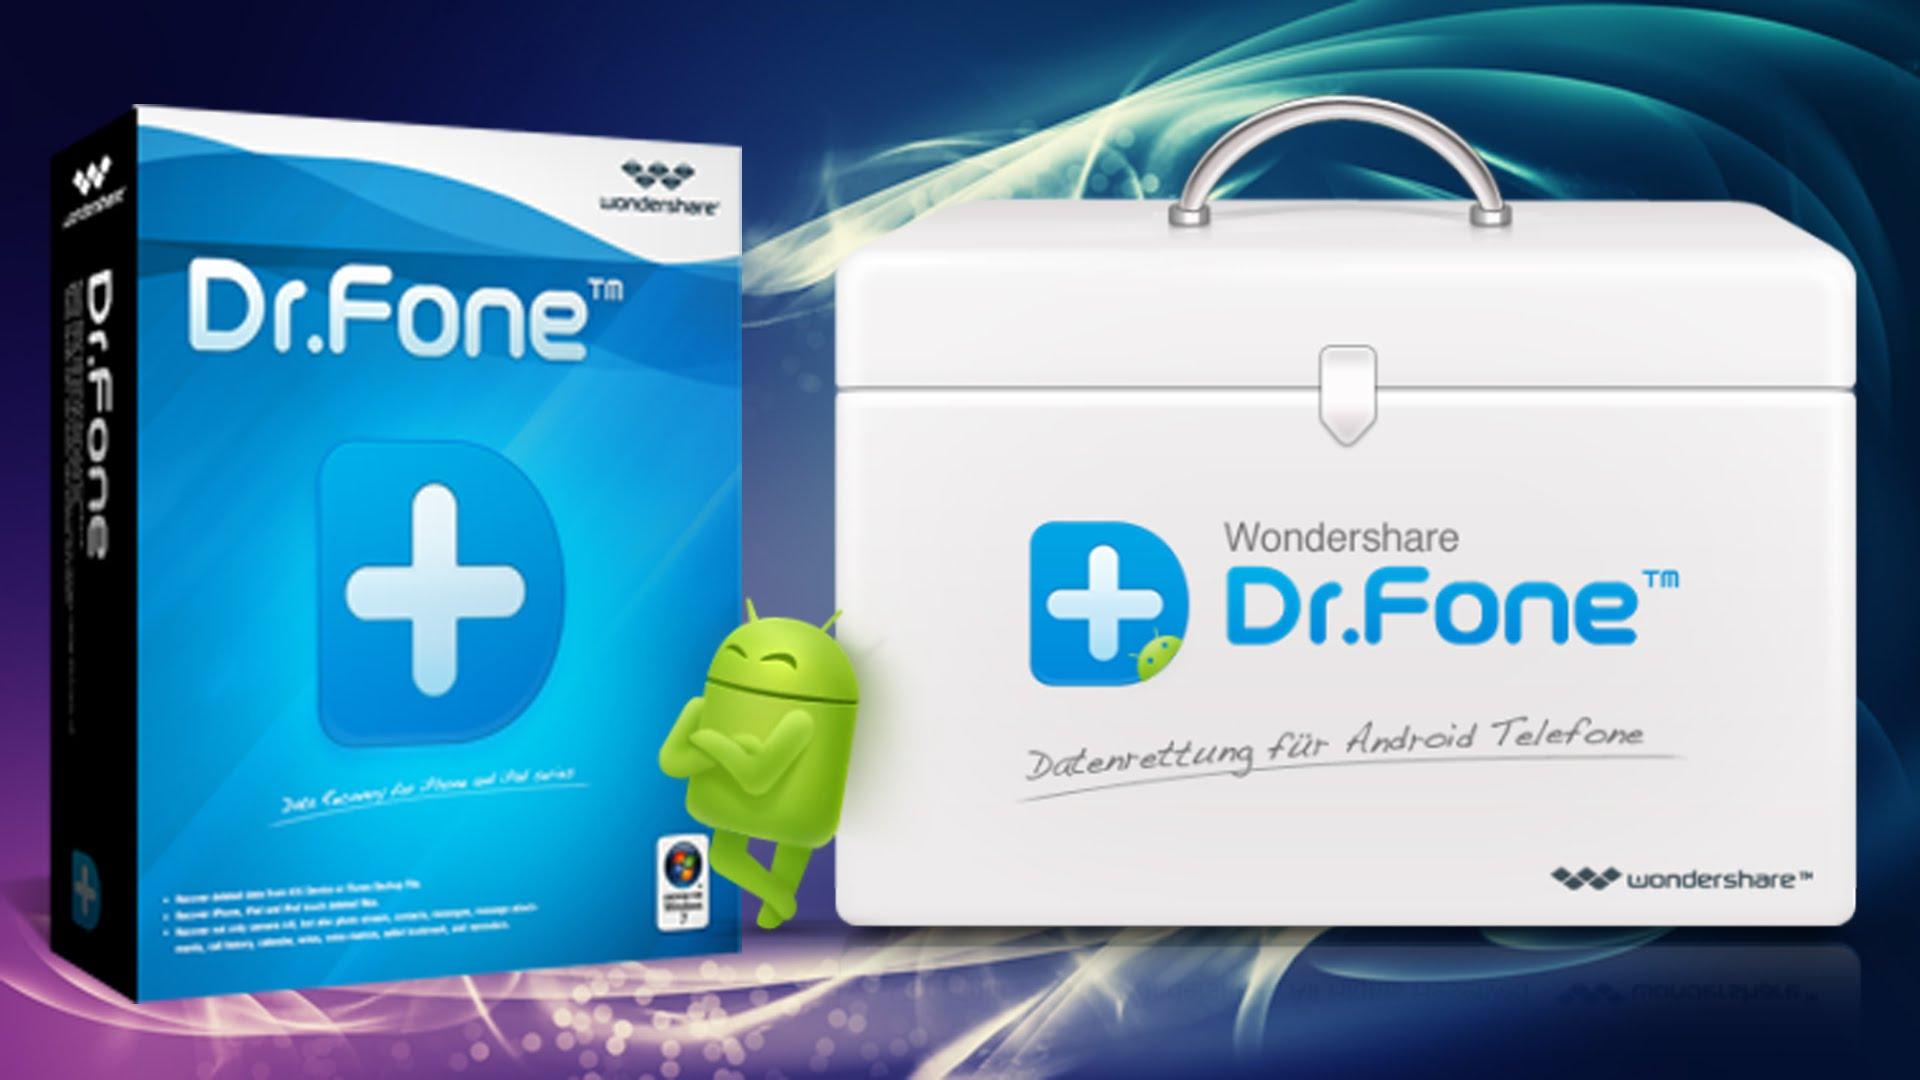 Wondershare Dr.Fone 2020 Crack